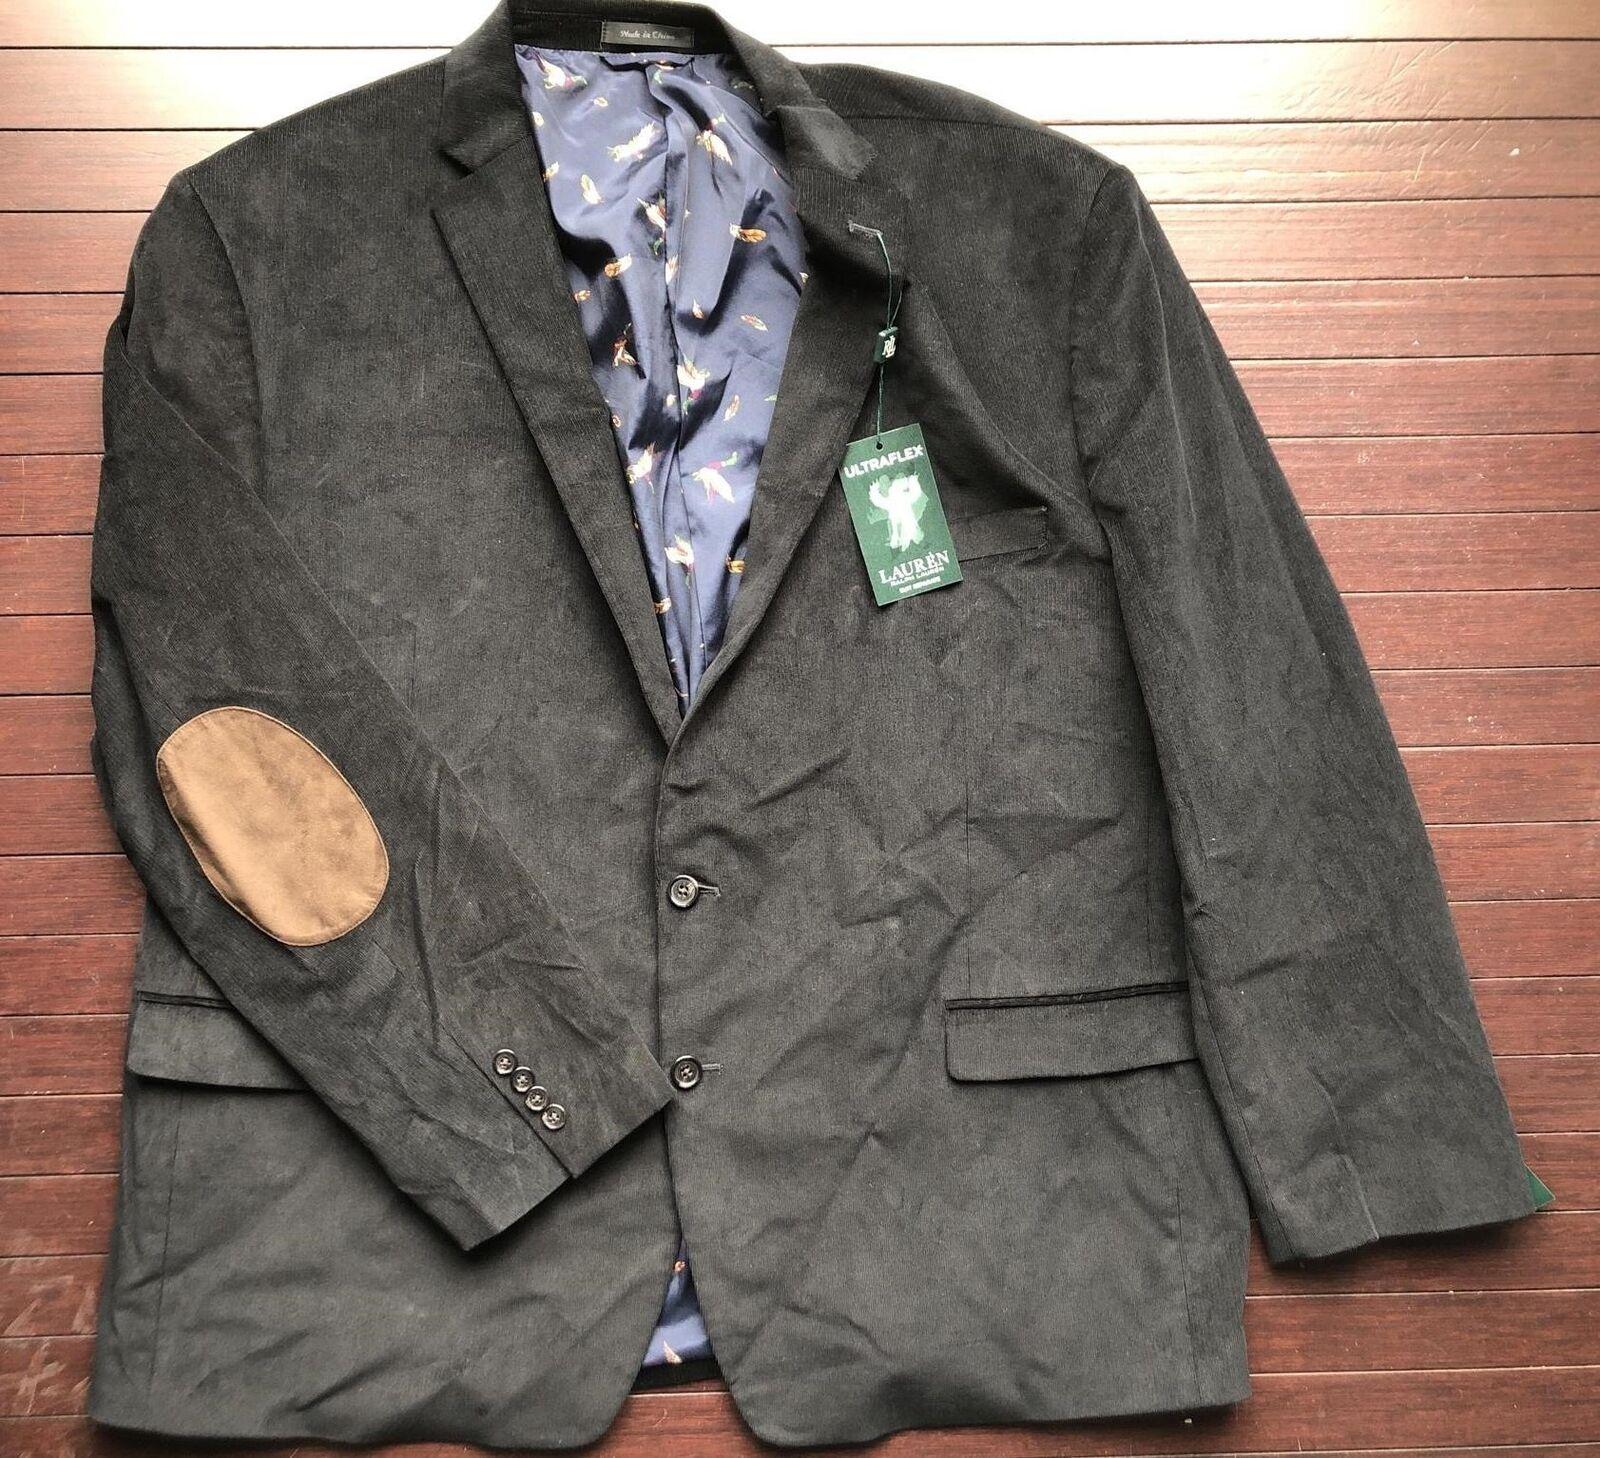 Polo Ralph Lauren Stretch Ultra Flex Sport Corduroy Coat Mens Size 56L New